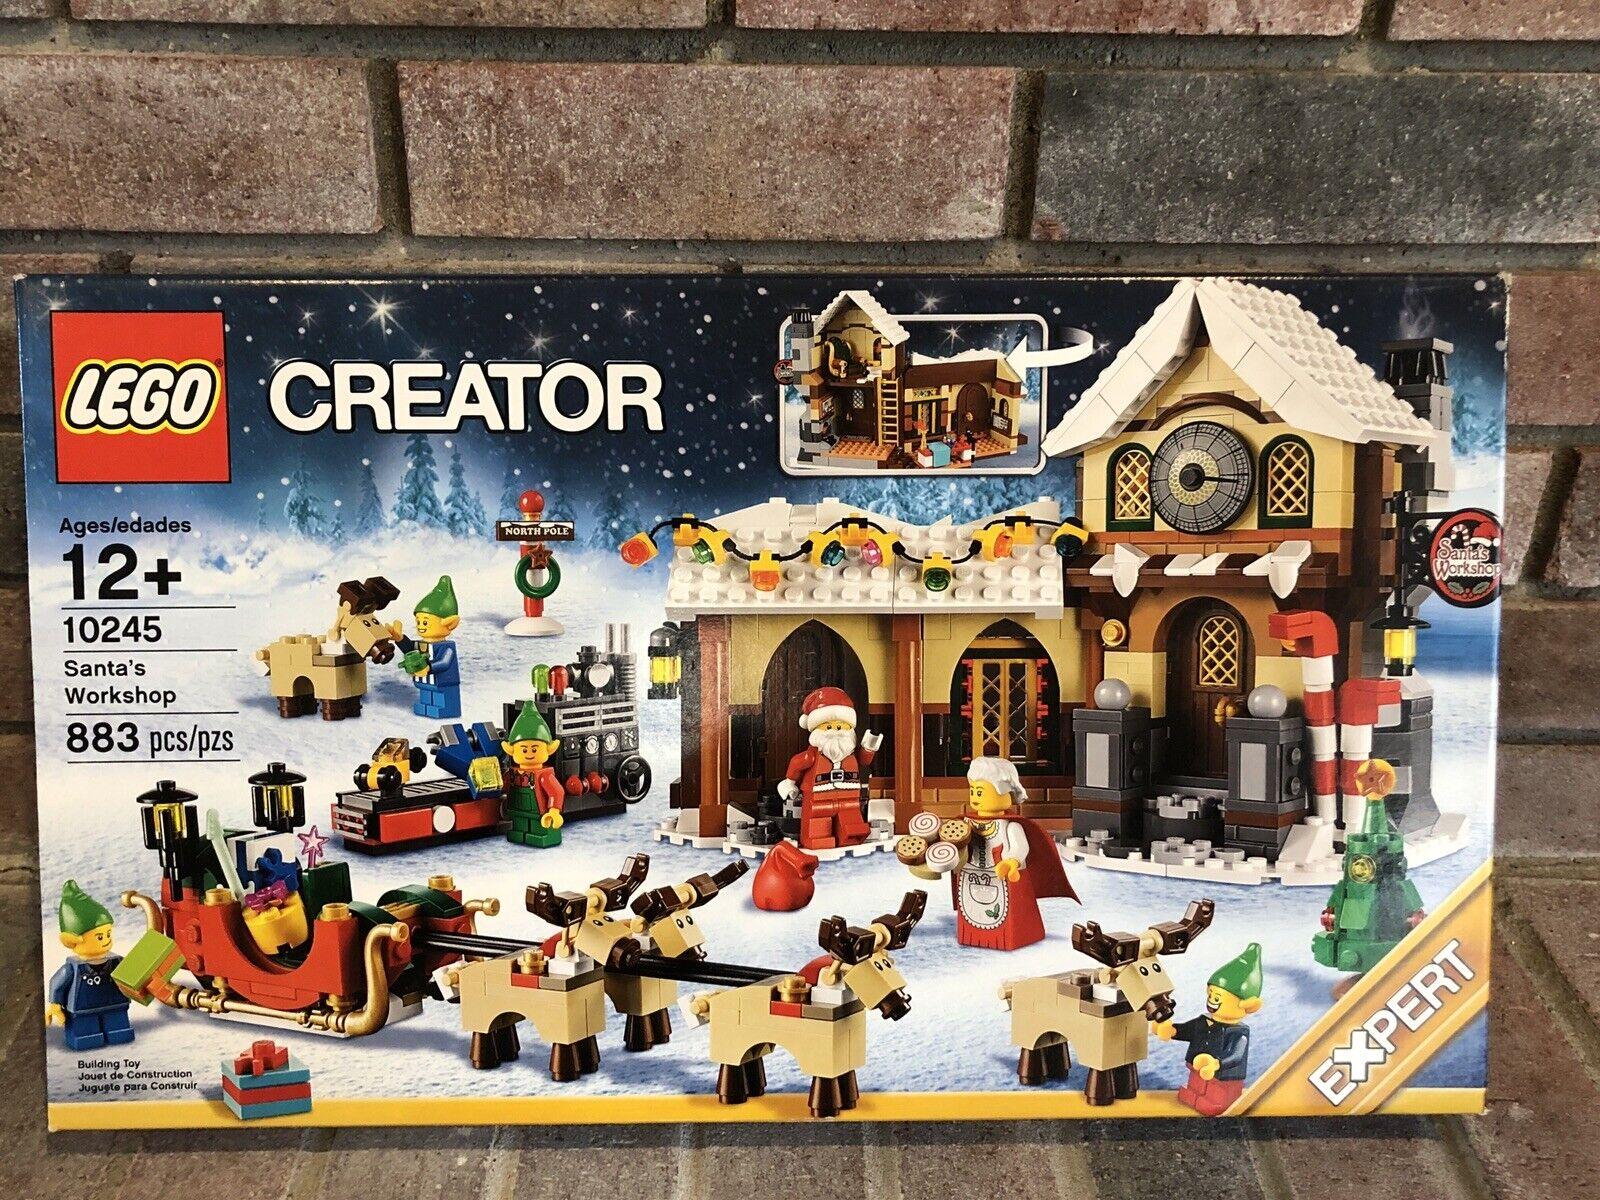 moda classica LEGO Creator Expert Santa's lavoronegozio  10245 Christmas Christmas Christmas Rare & Hard to Find nuovo  vendite online